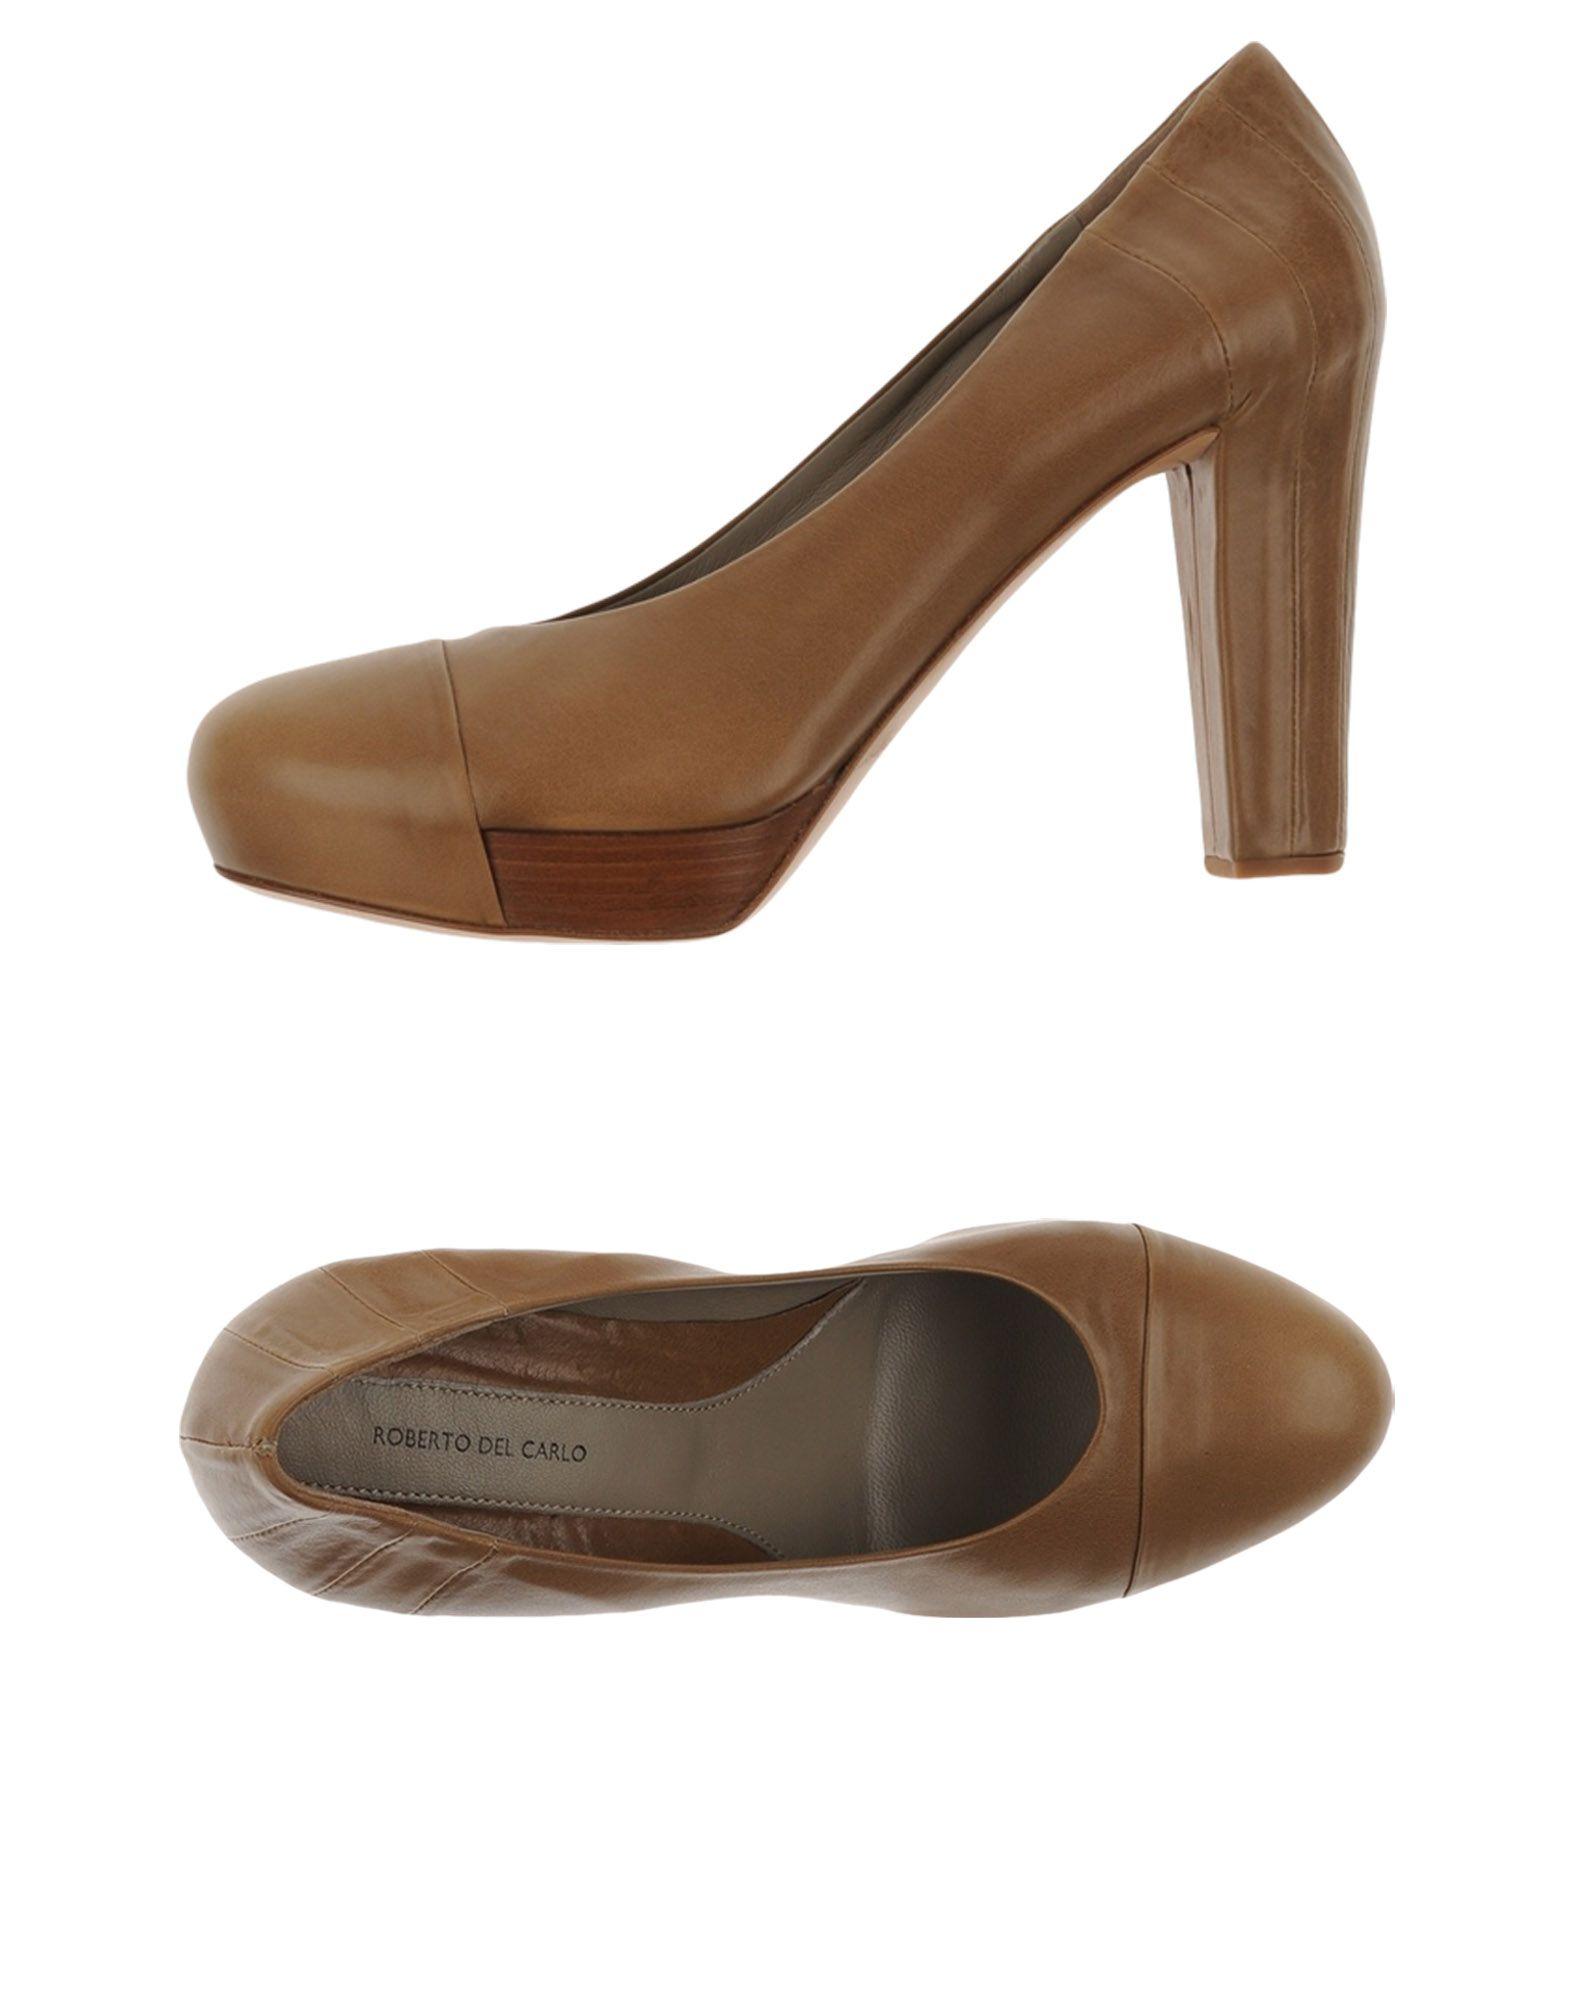 Stilvolle billige Pumps Schuhe Roberto Del Carlo Pumps billige Damen  11037405BK 787d99